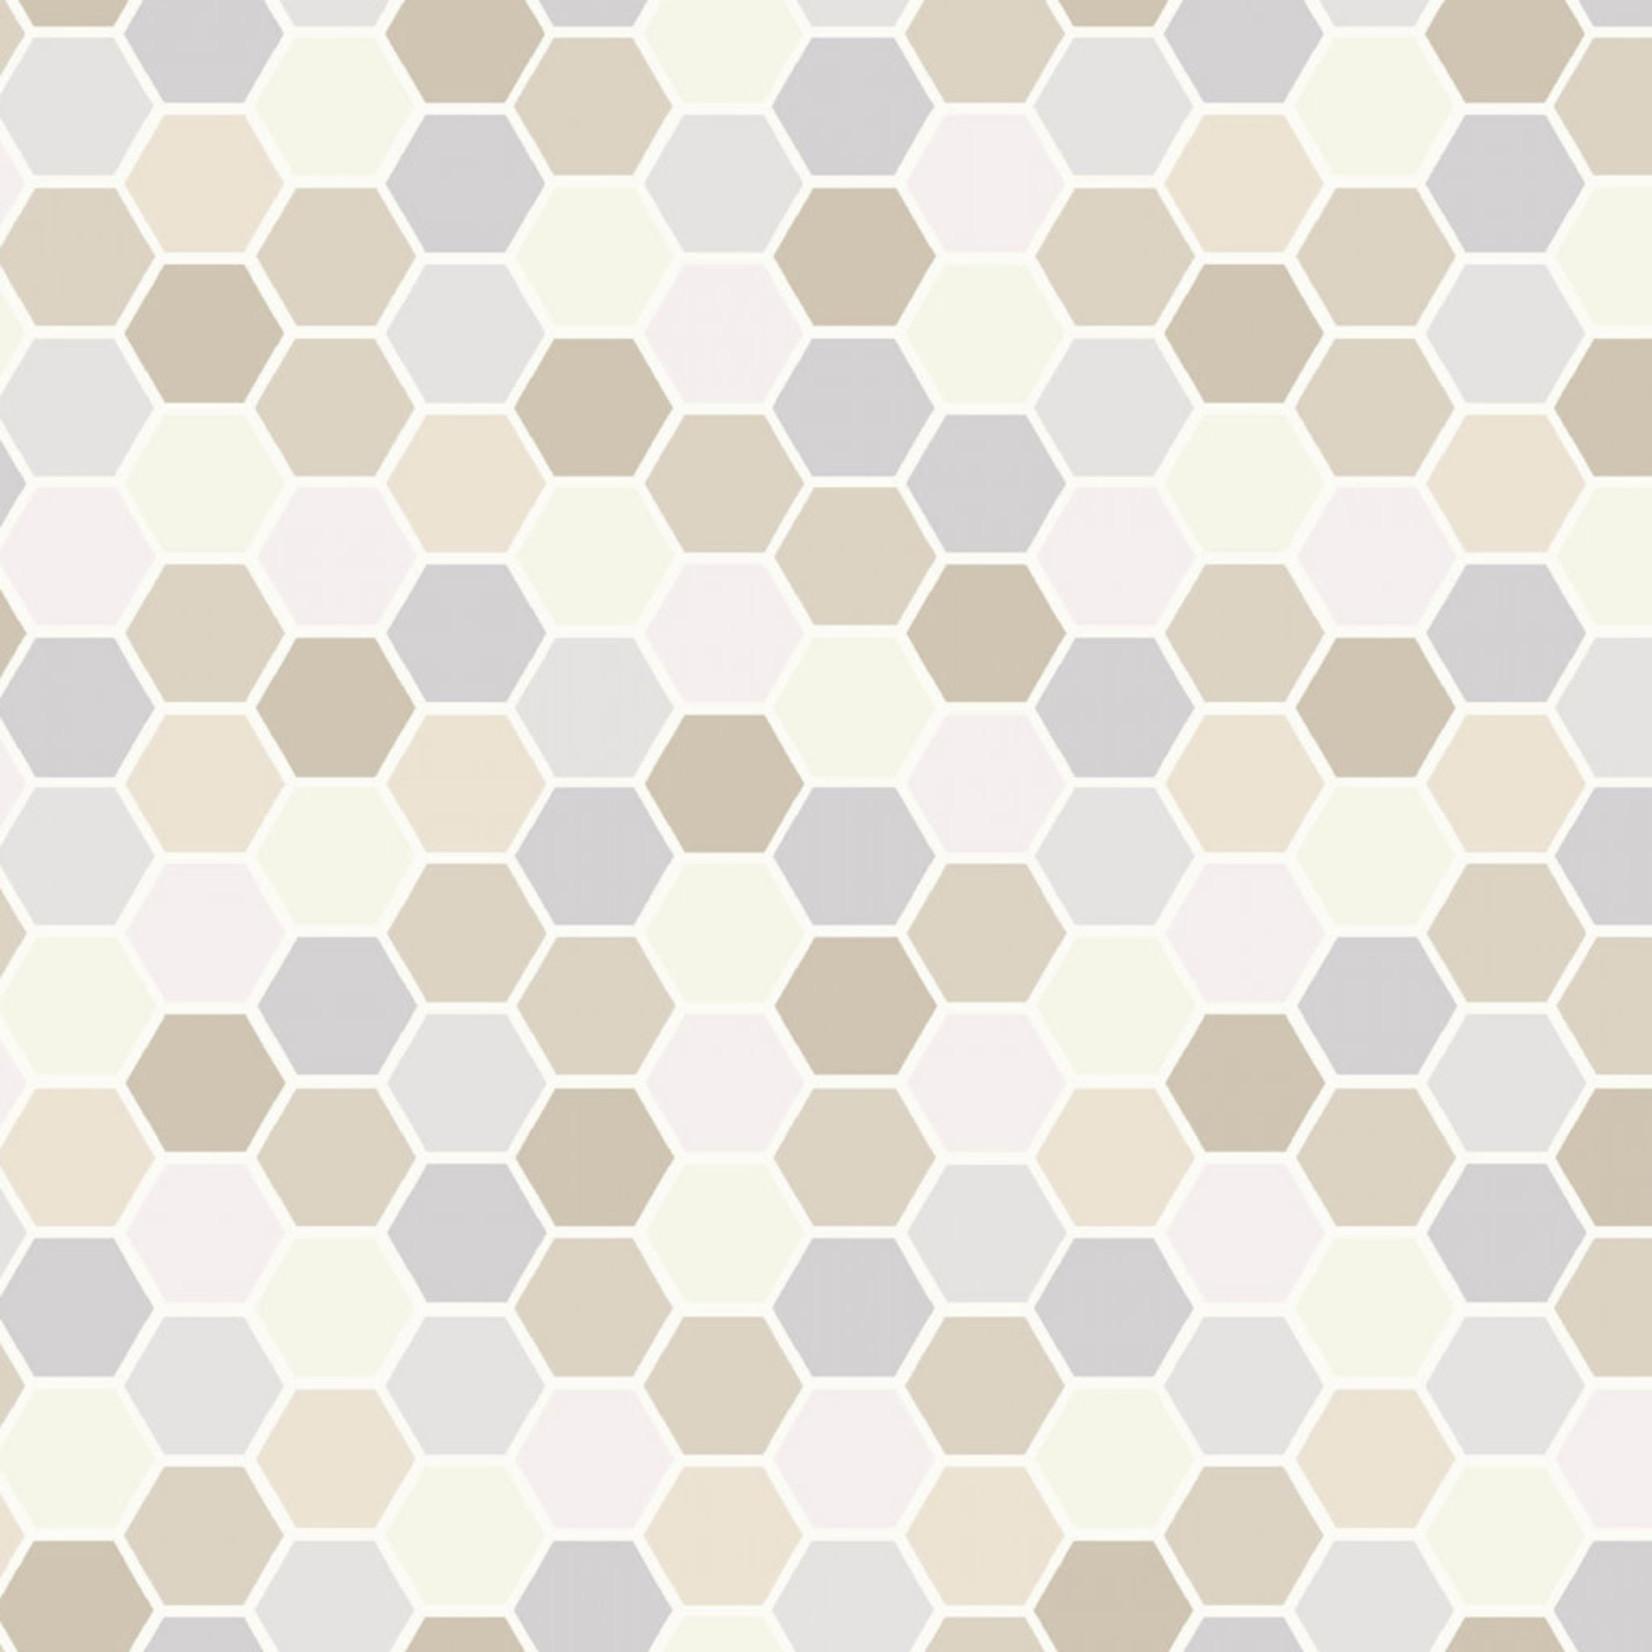 Maywood Studio Make Yourself at Home - Tile - Cream